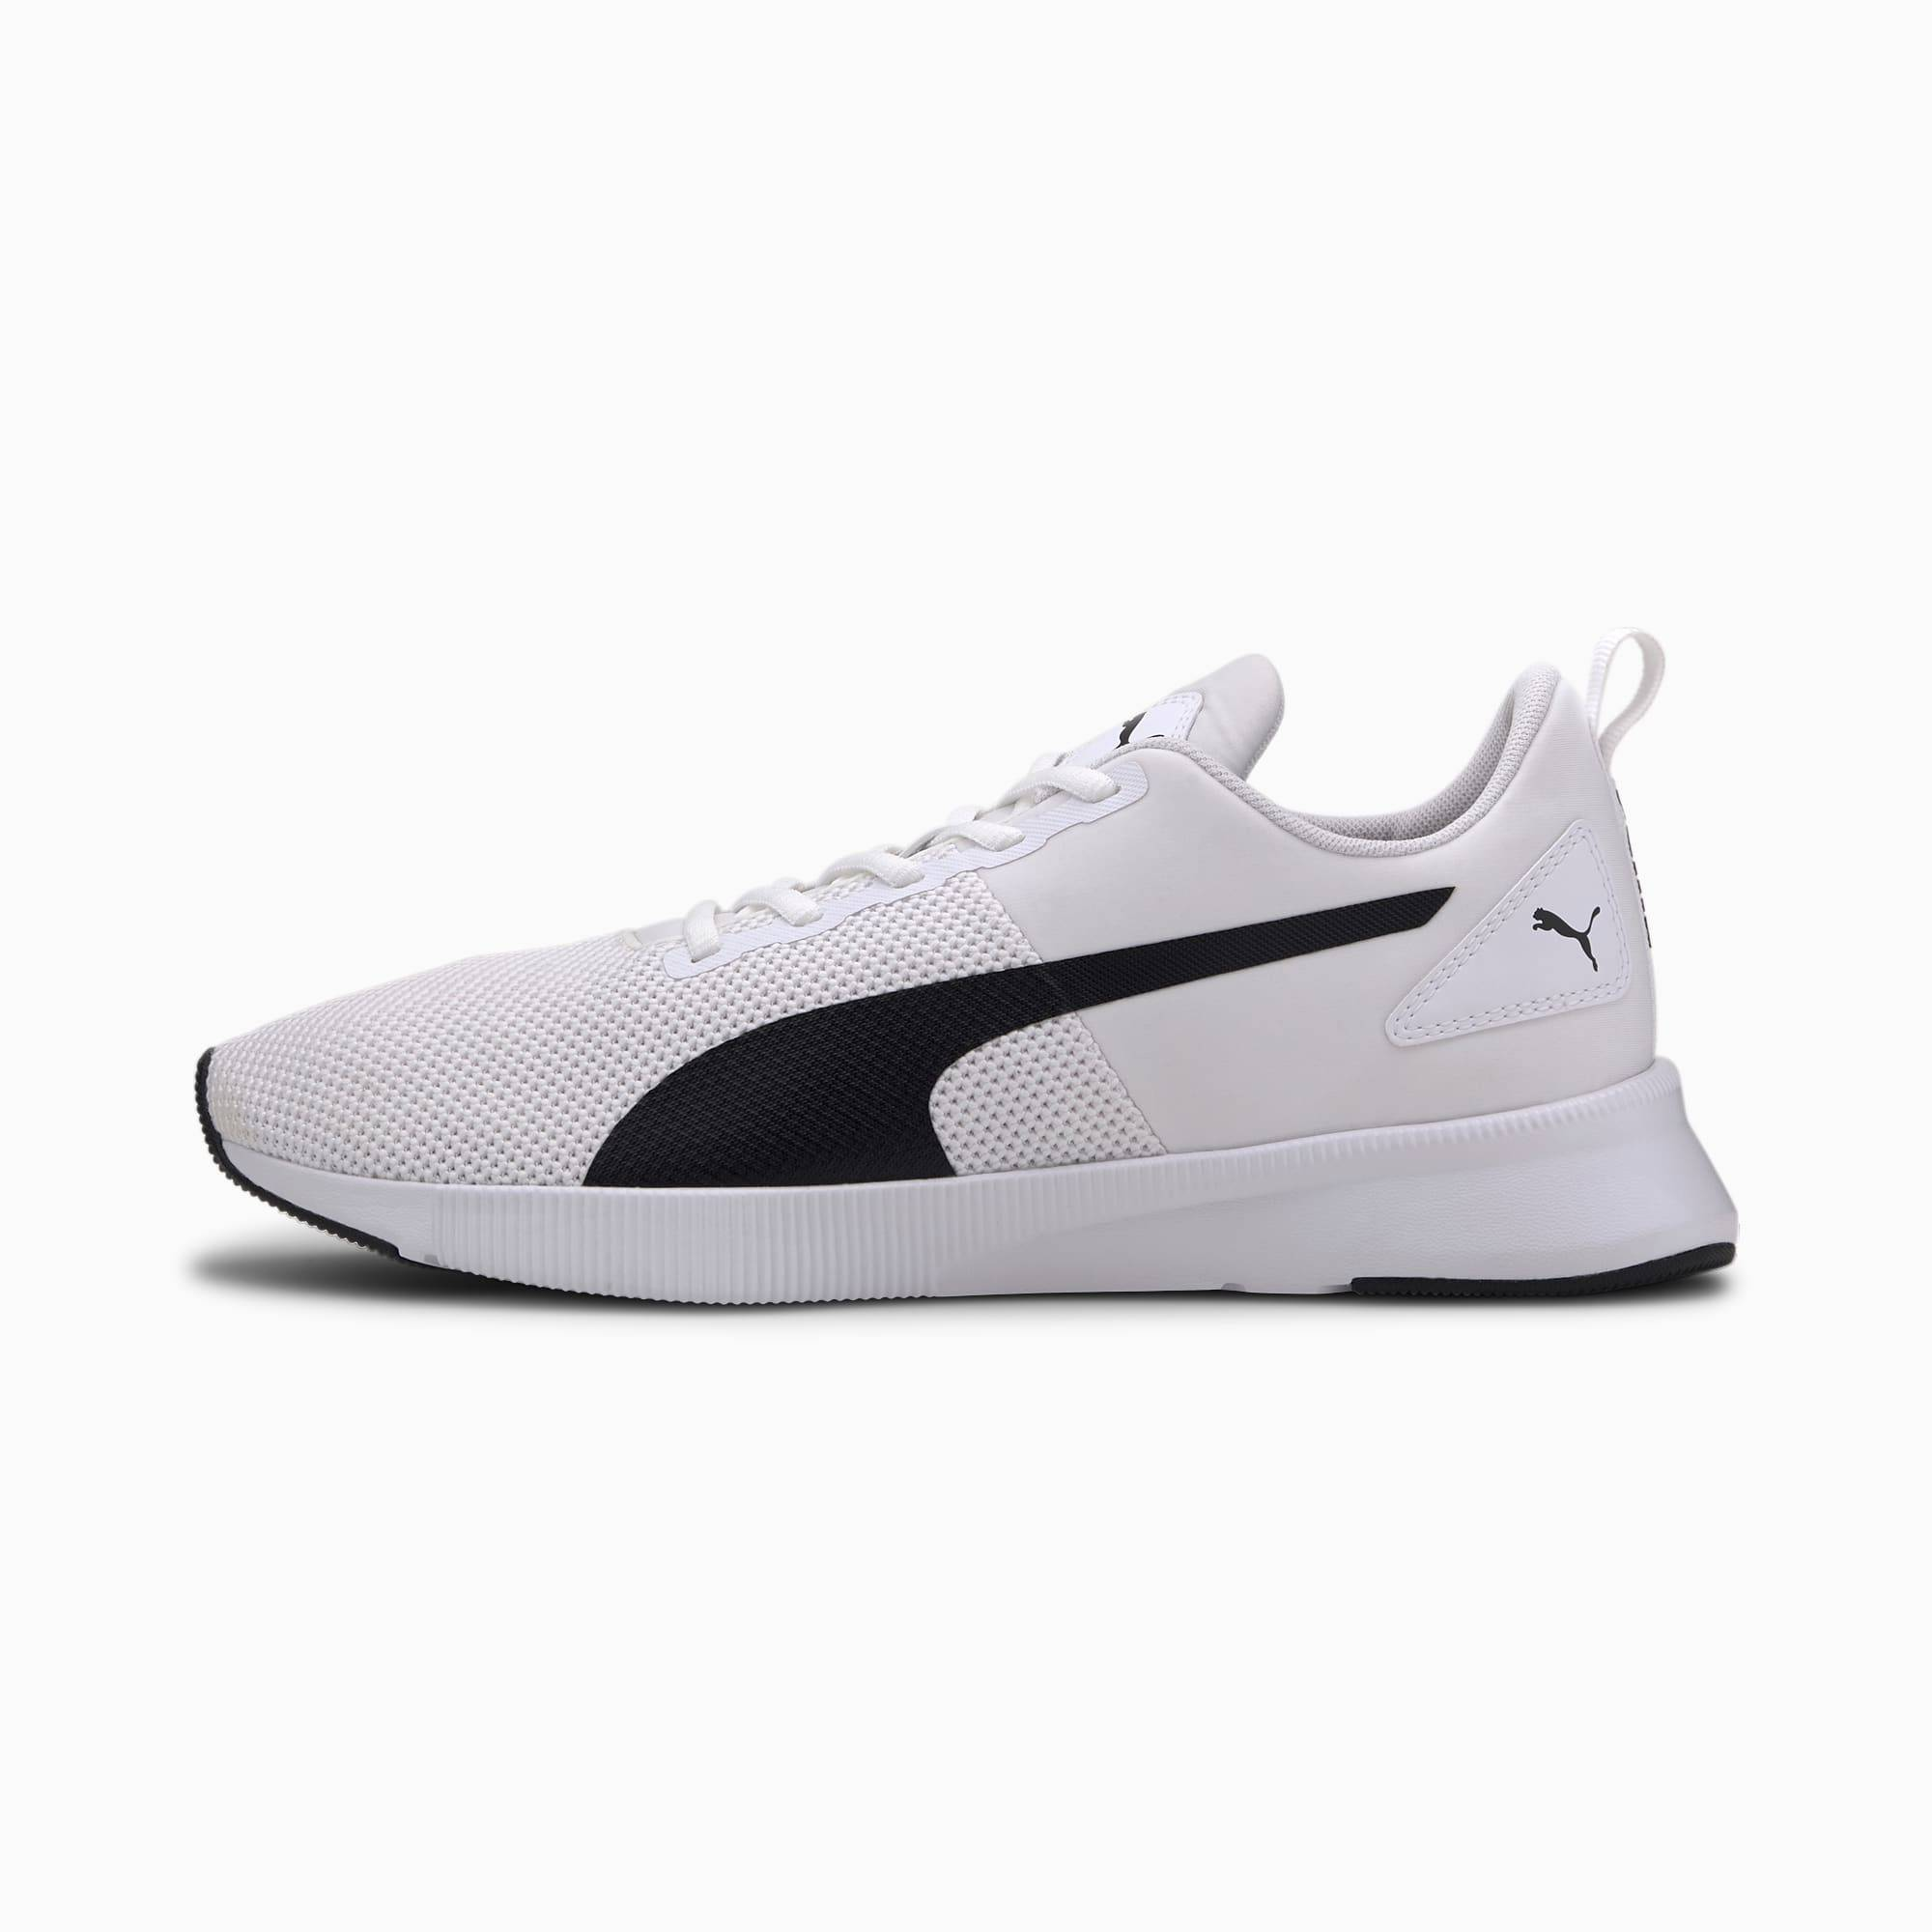 PUMA Chaussure de course Flyer Runner, Blanc/Noir, Taille 44, Chaussures